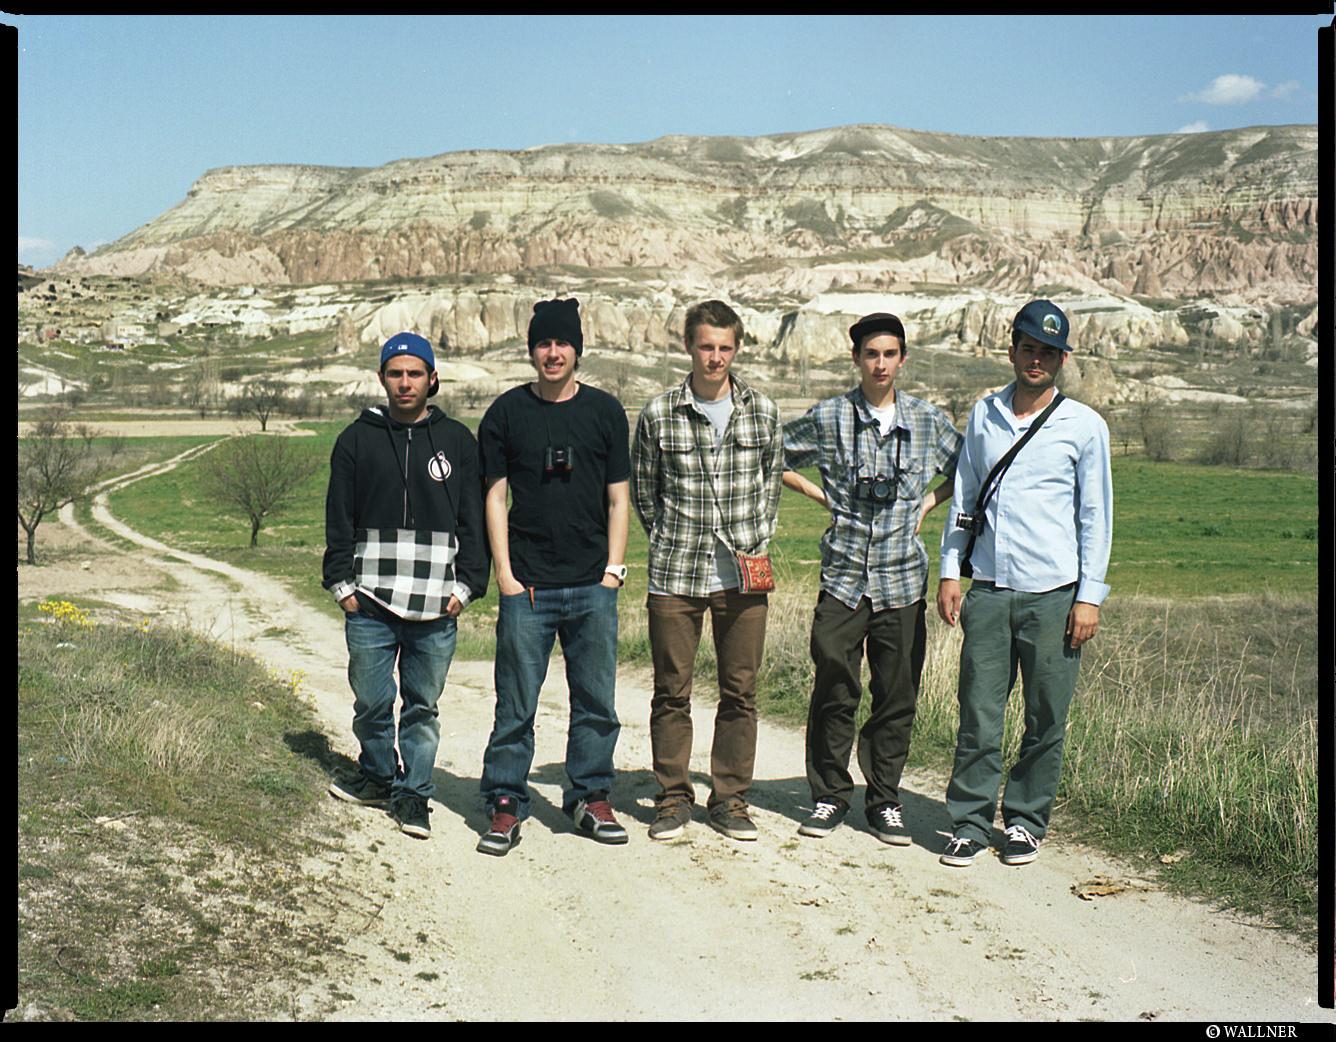 MediumFormatPatrikWallner_Cappadocia_NuriKirillStasTannerKennyCap_LOWQ